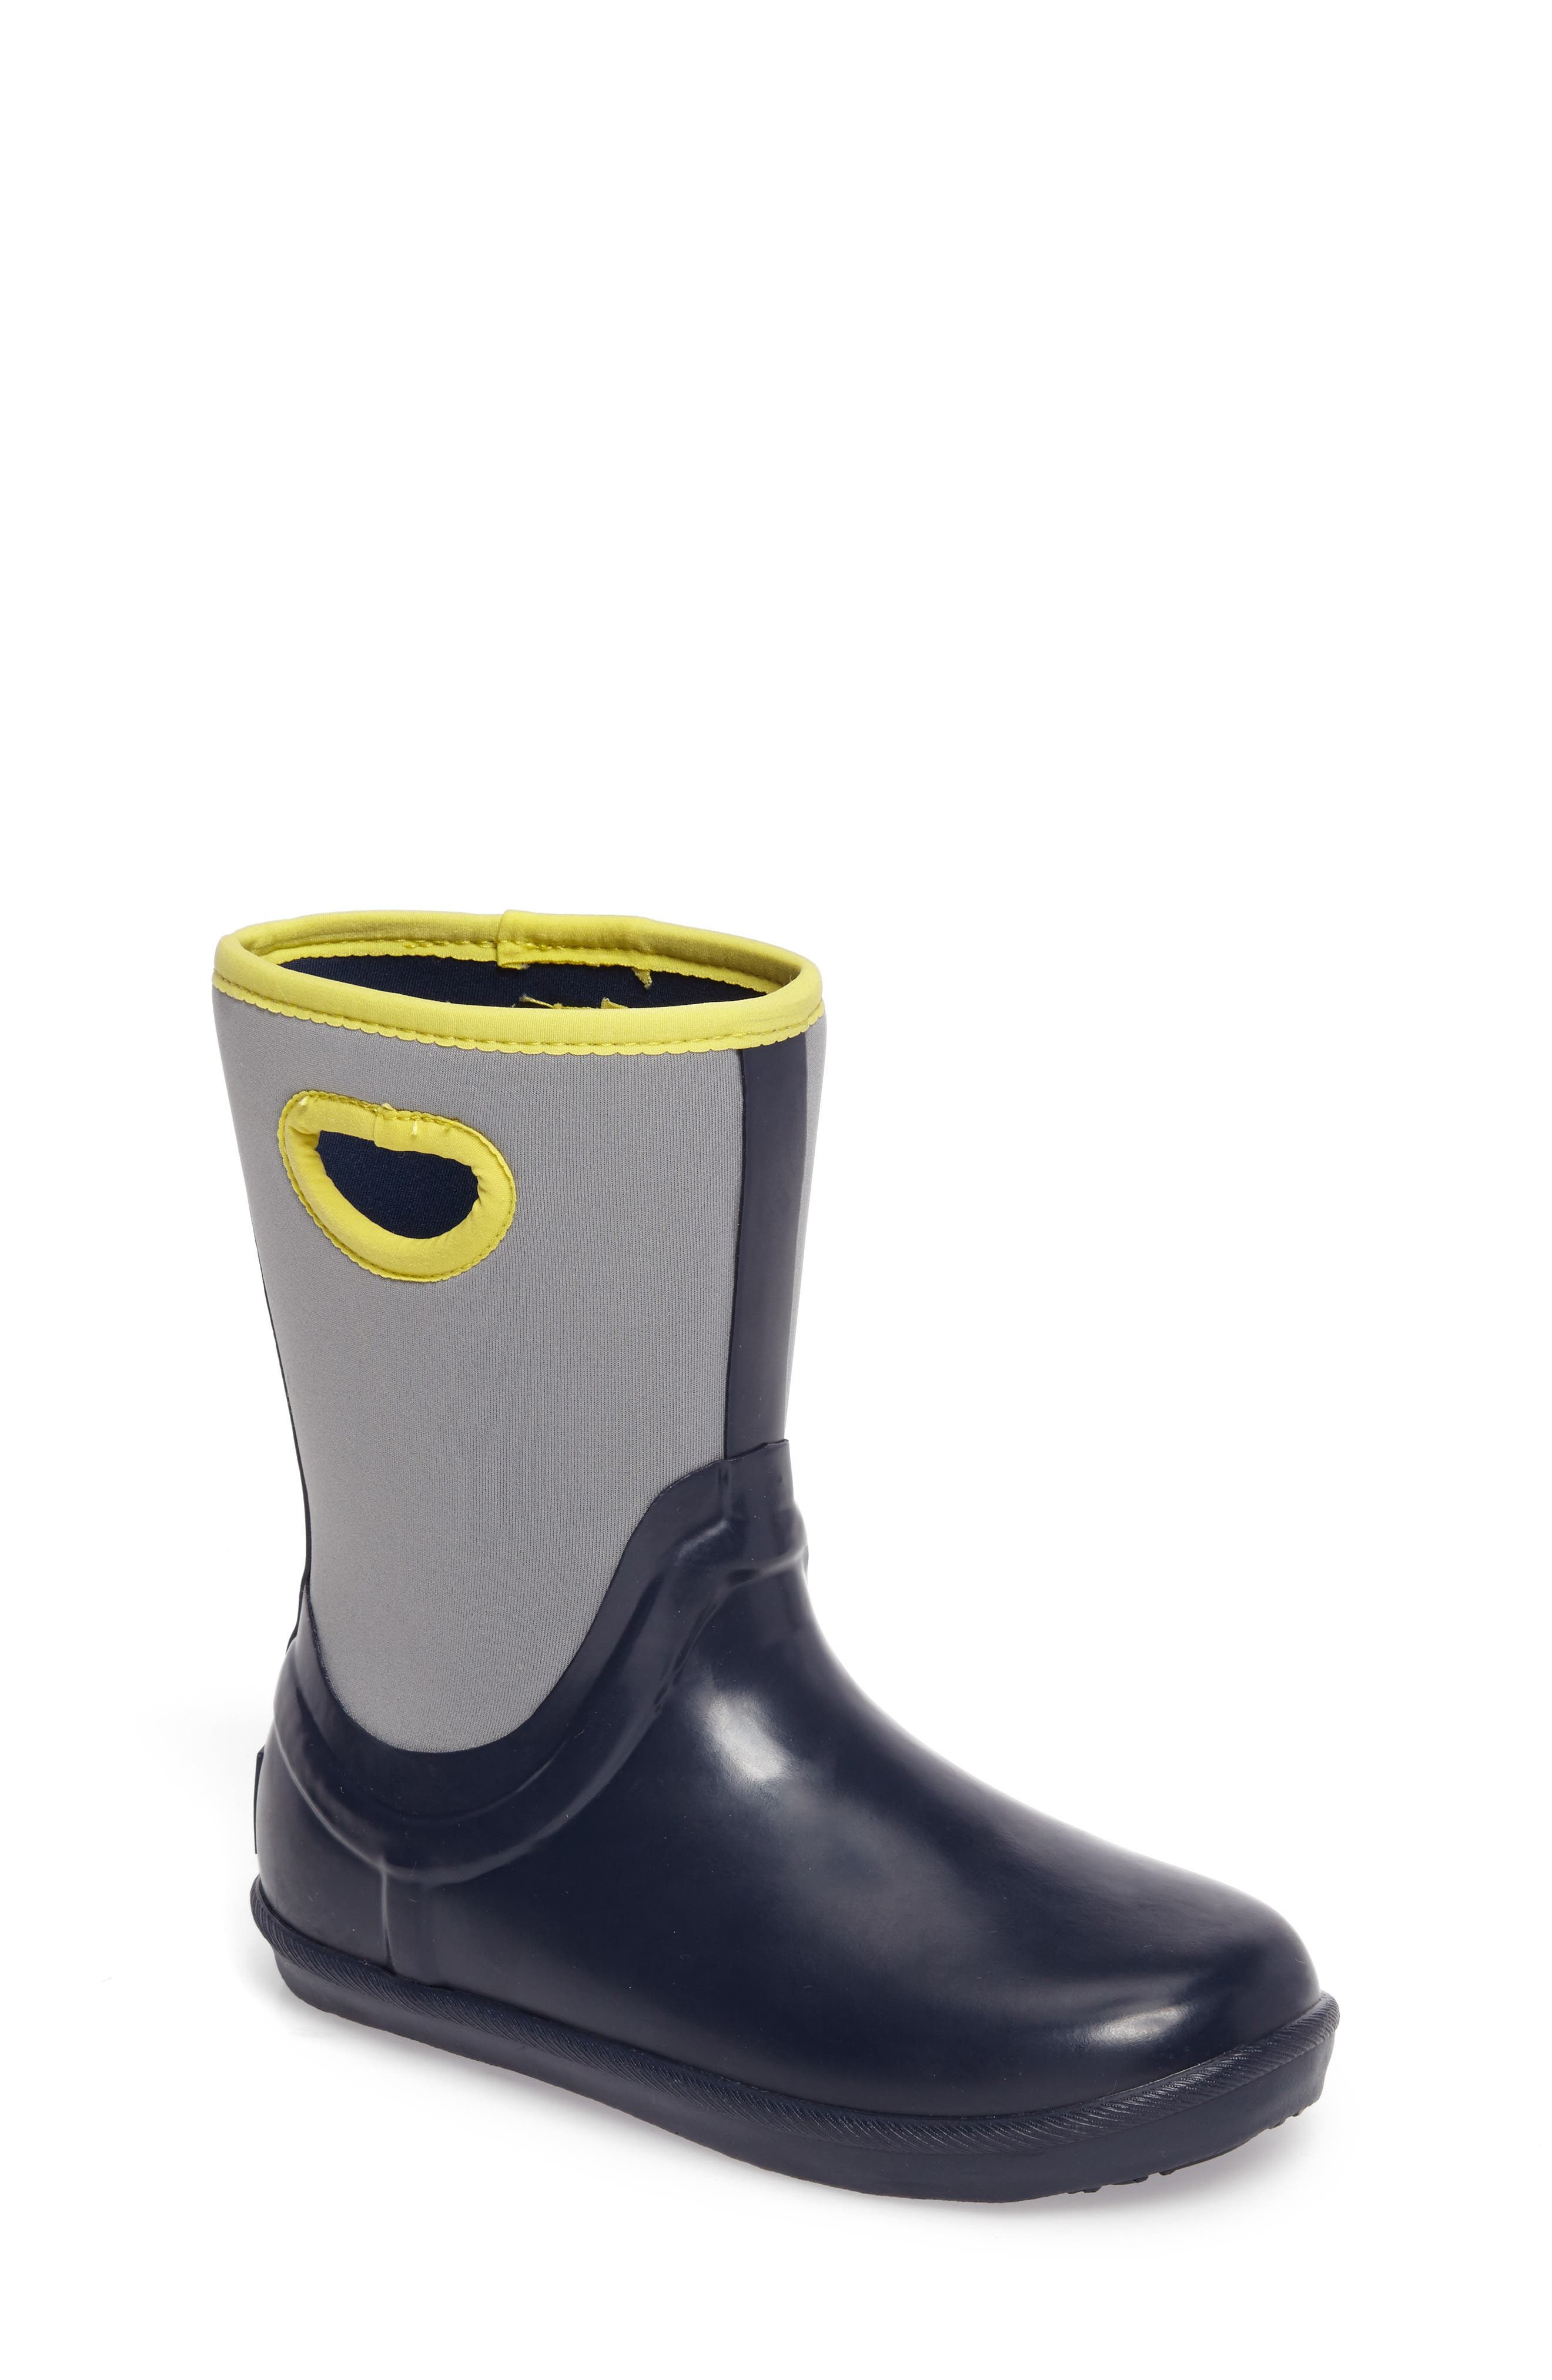 Kex Waterproof Boot,                             Main thumbnail 2, color,